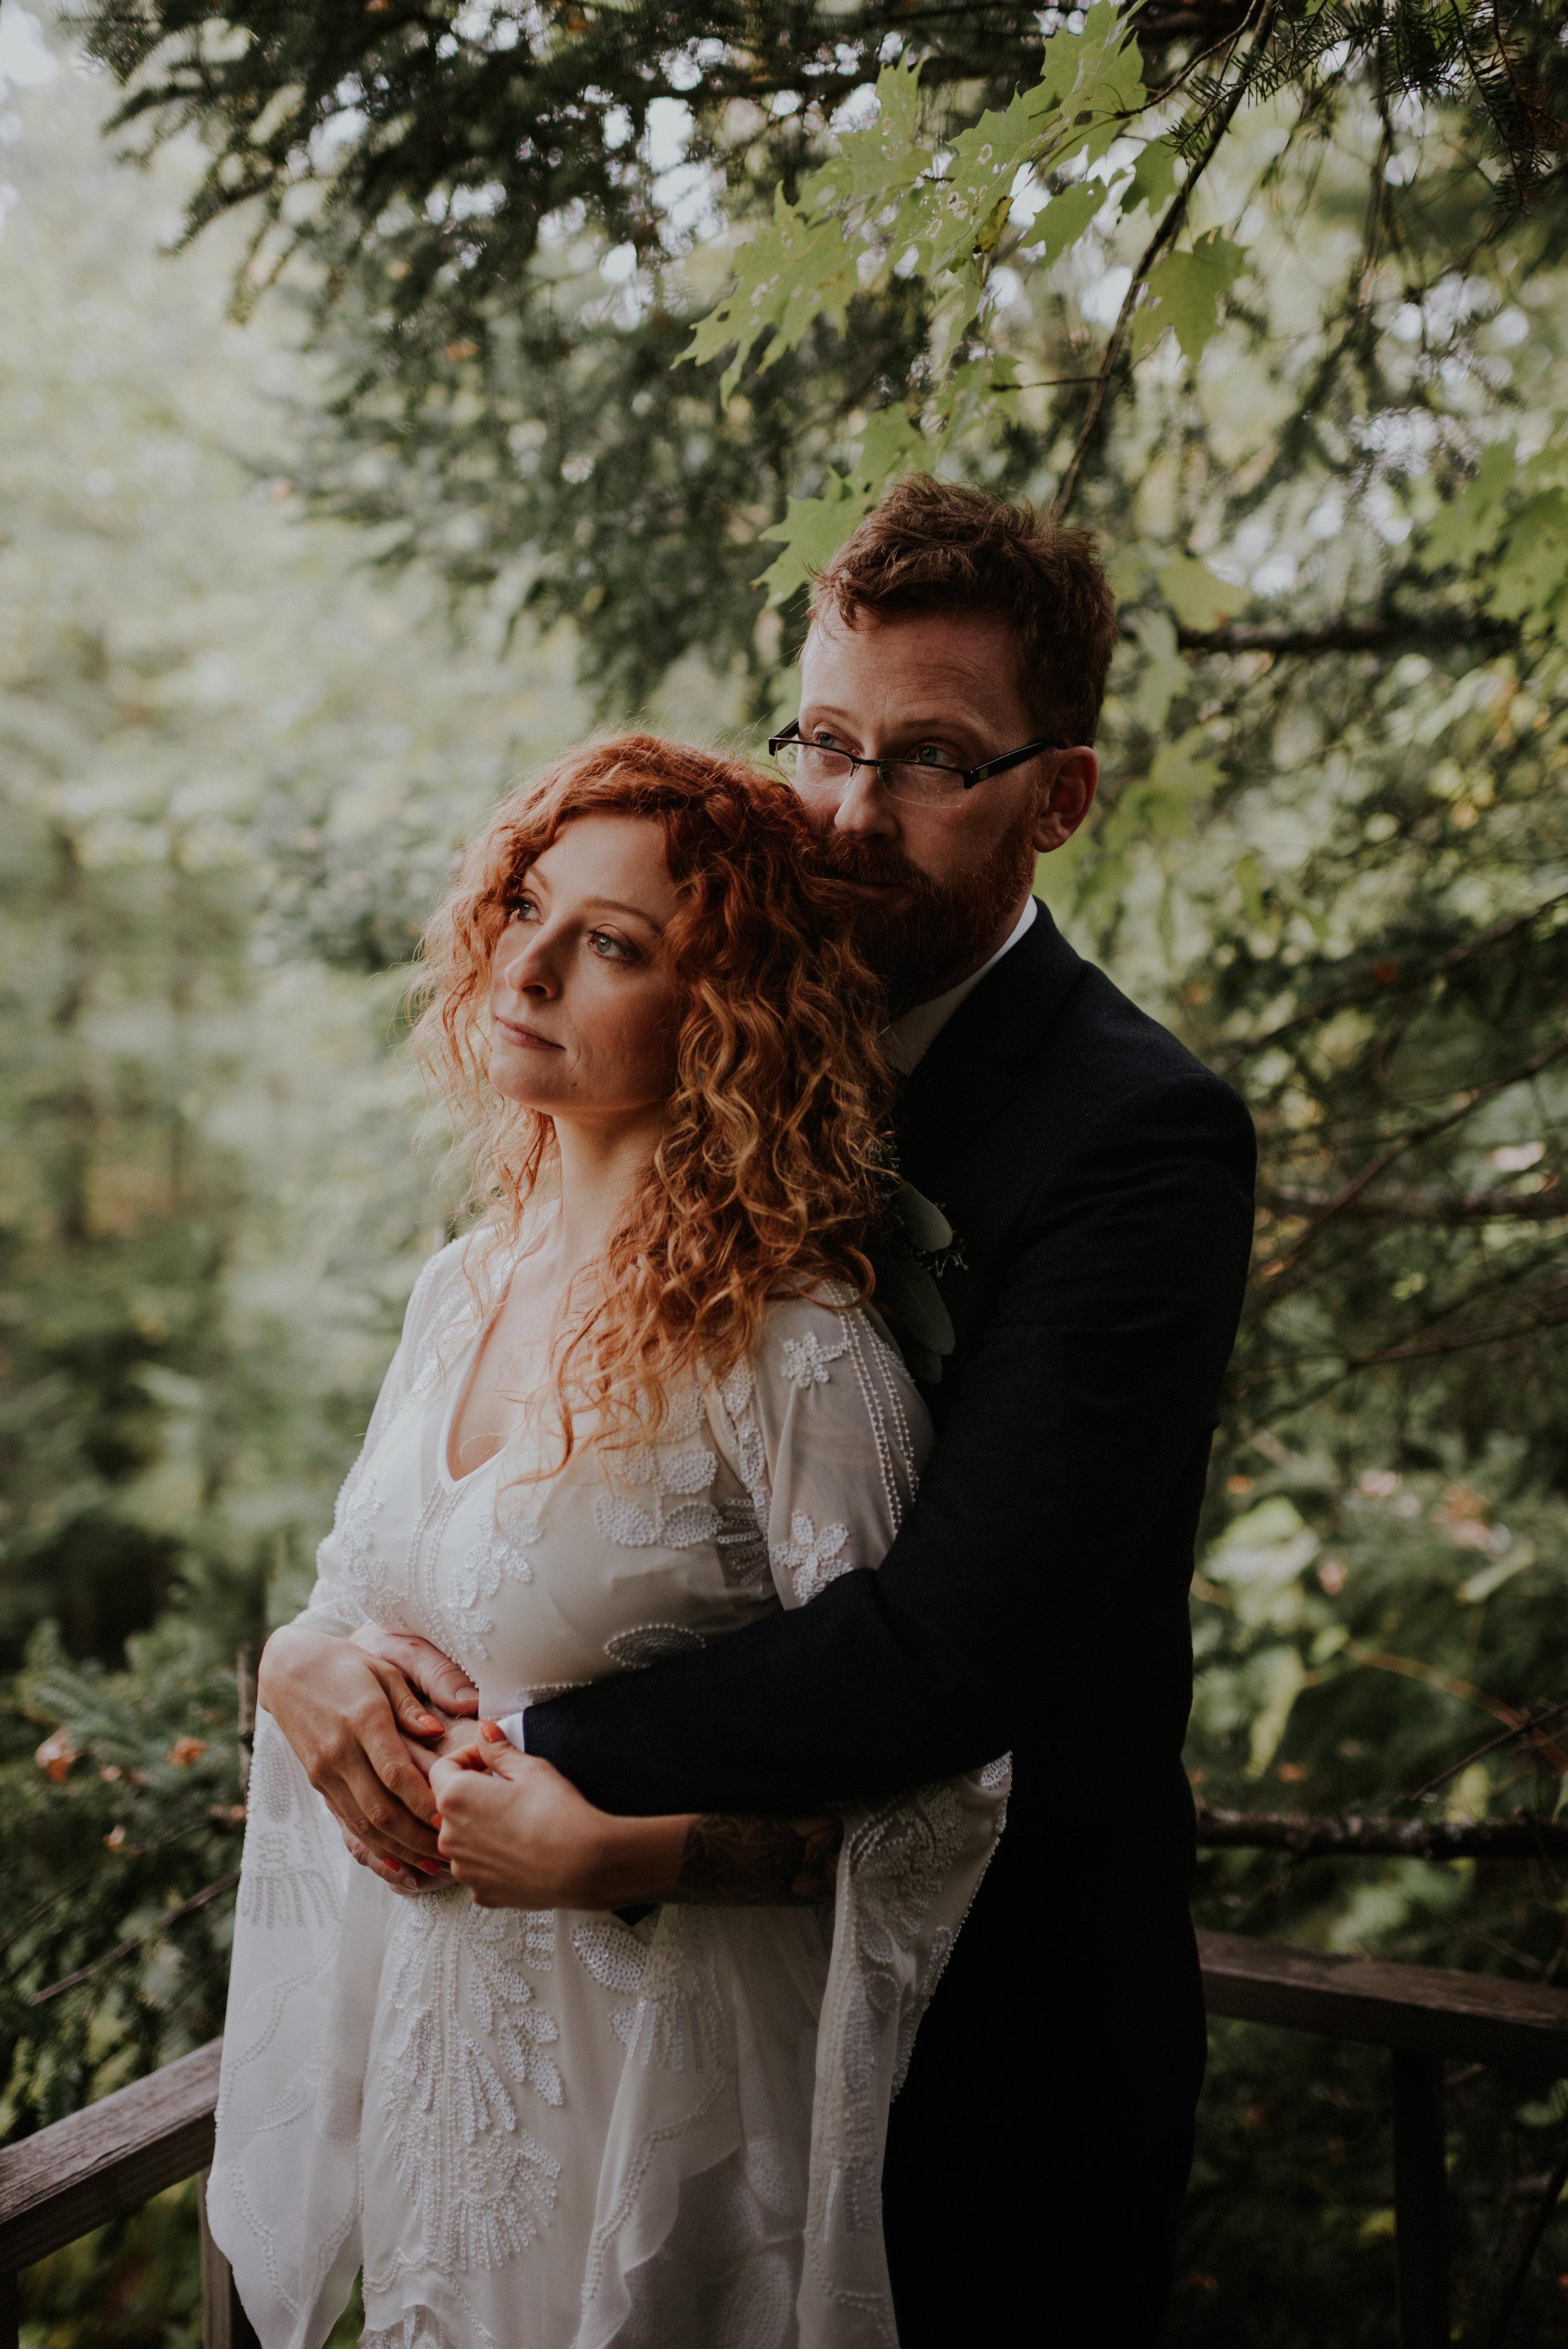 wildsoulsstudio-woodland-intimate-newengland-wedding-lake willoughby-p-107.jpg